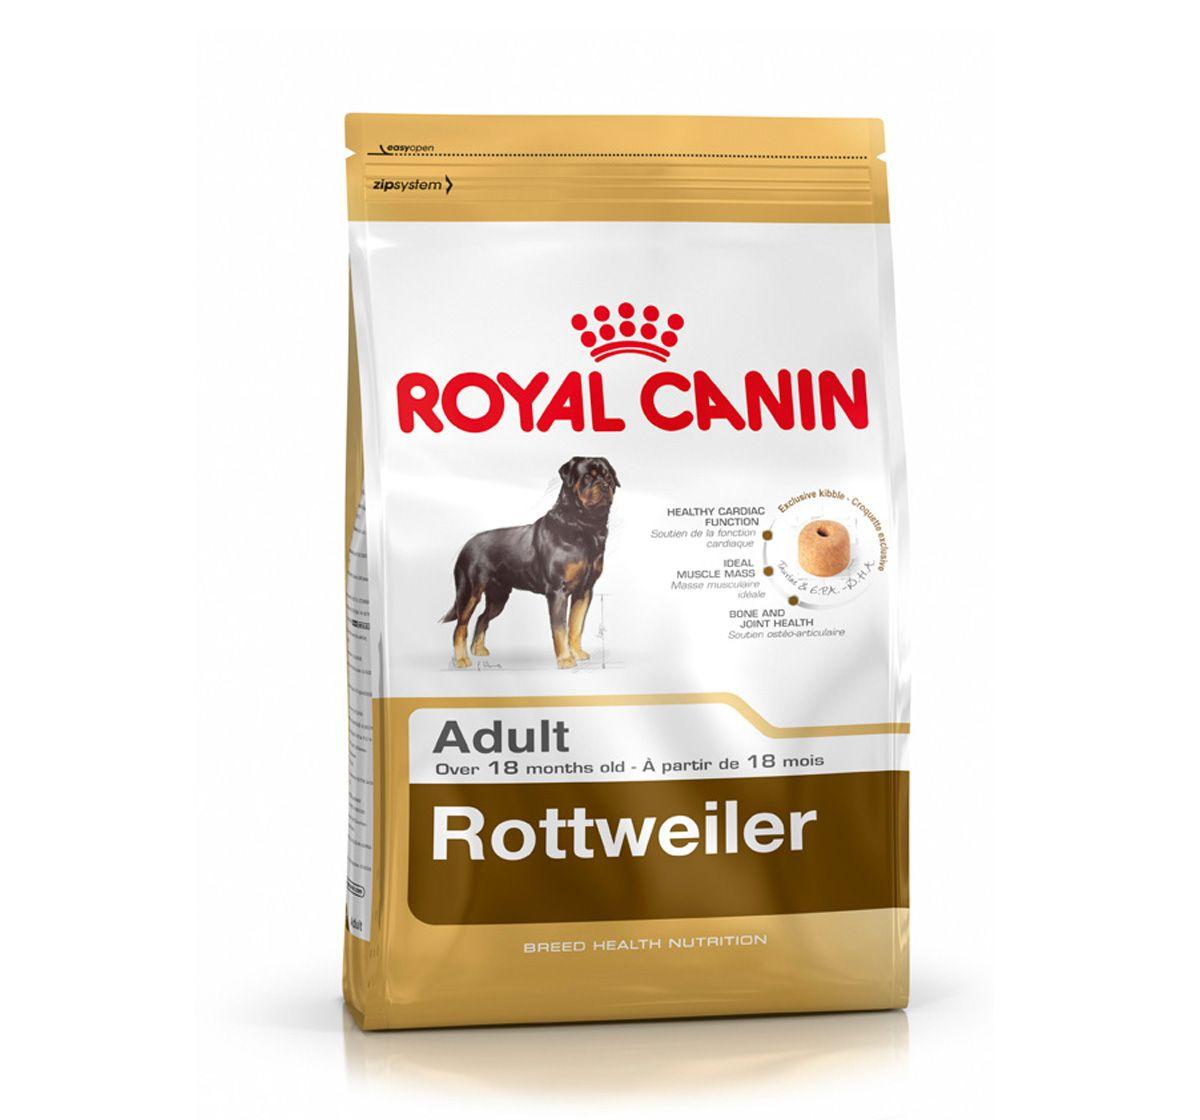 Royal Canin Rottweiler Adult 3 Kg Royal Canin Dog Food Dog